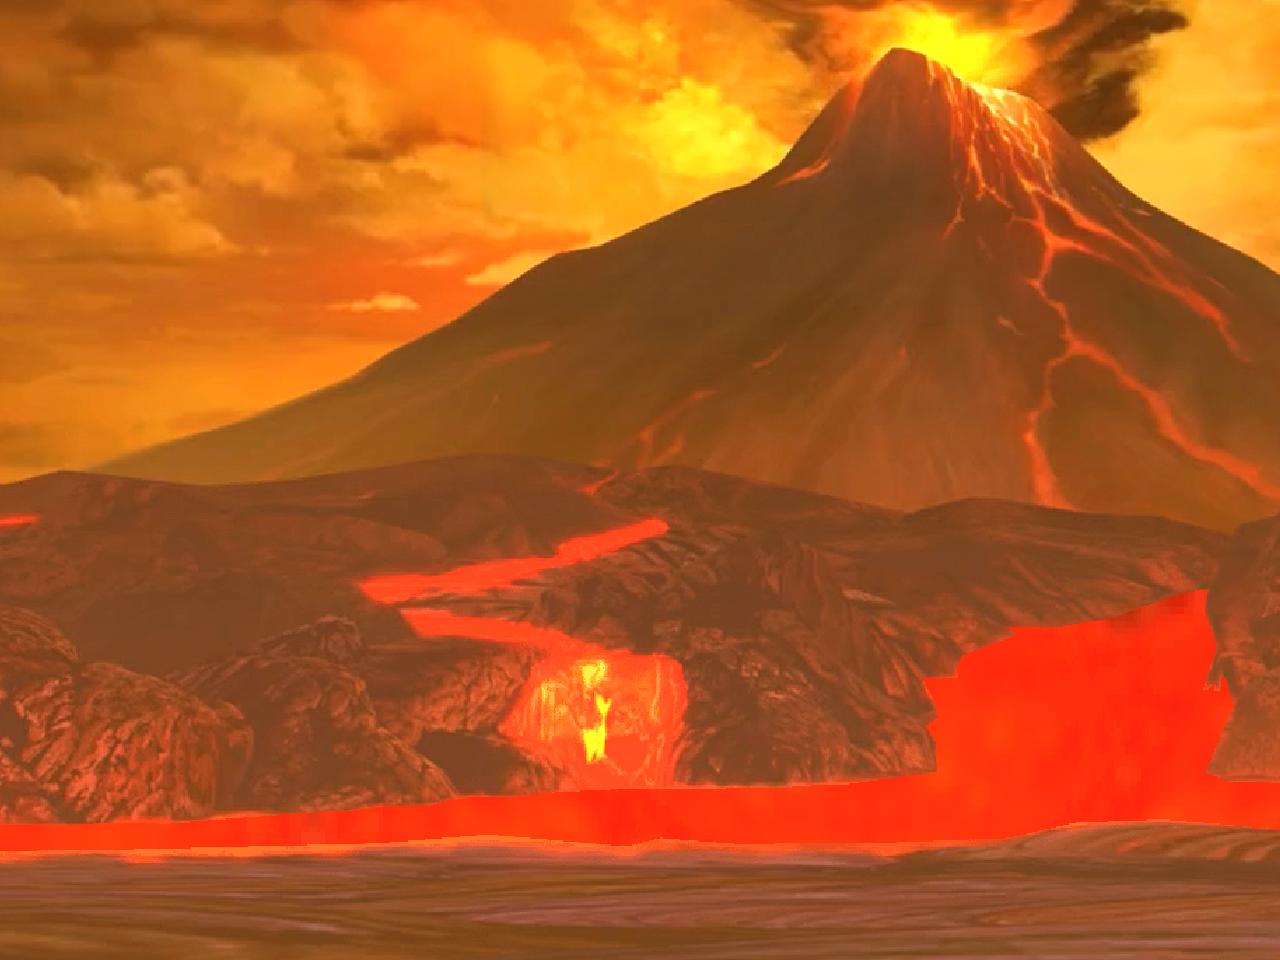 SFIV_Volcanic Rim 1.0/1.1